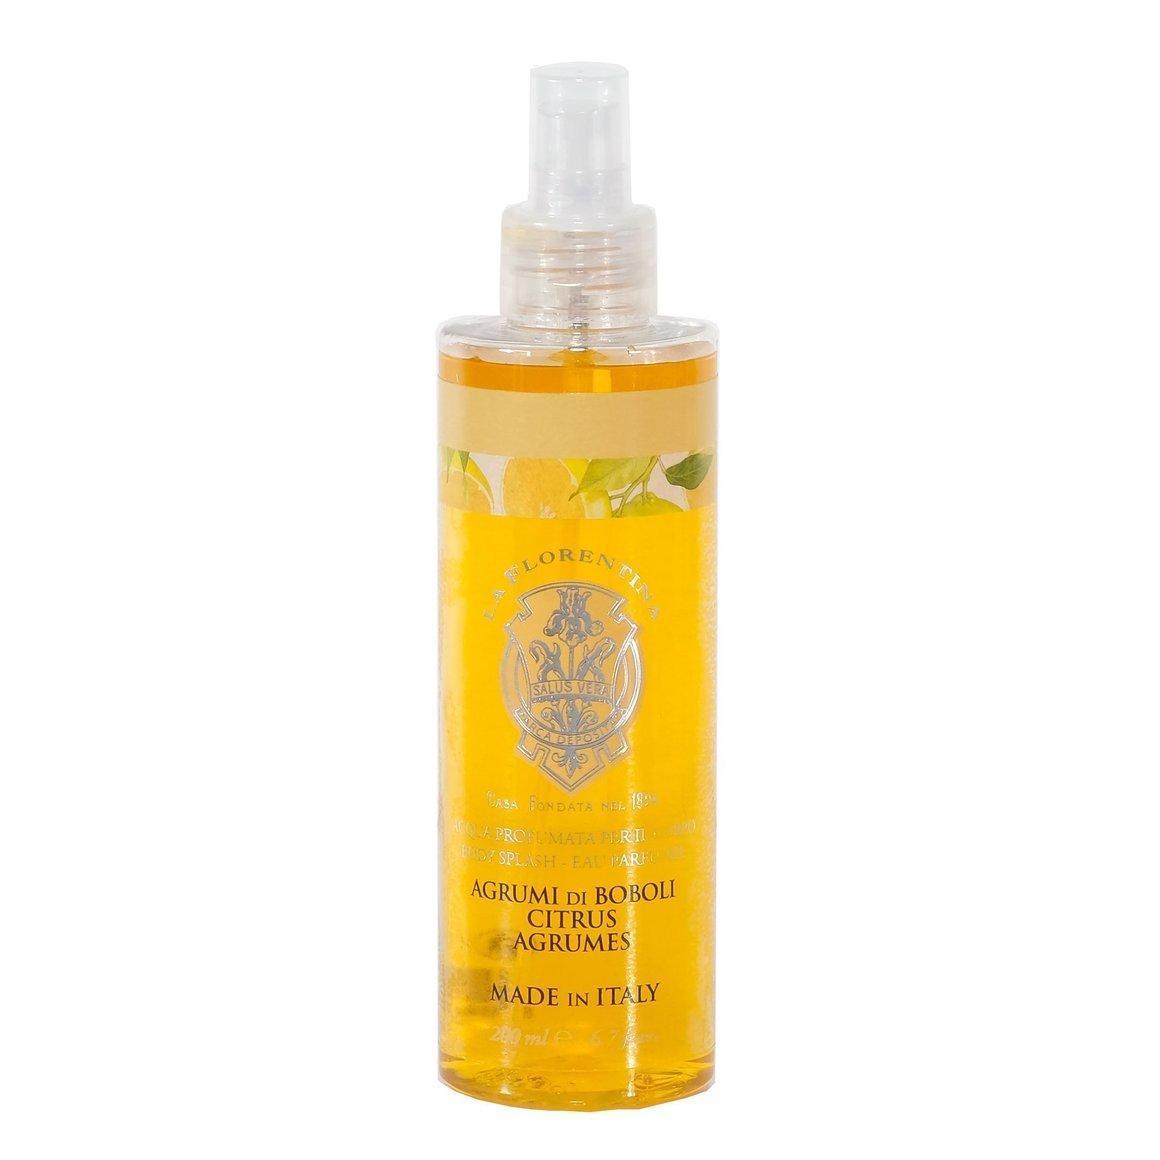 La Florentina Boboli Citrus Body Splash Natural Tuscan Scent 200 ml   Trada Marketplace